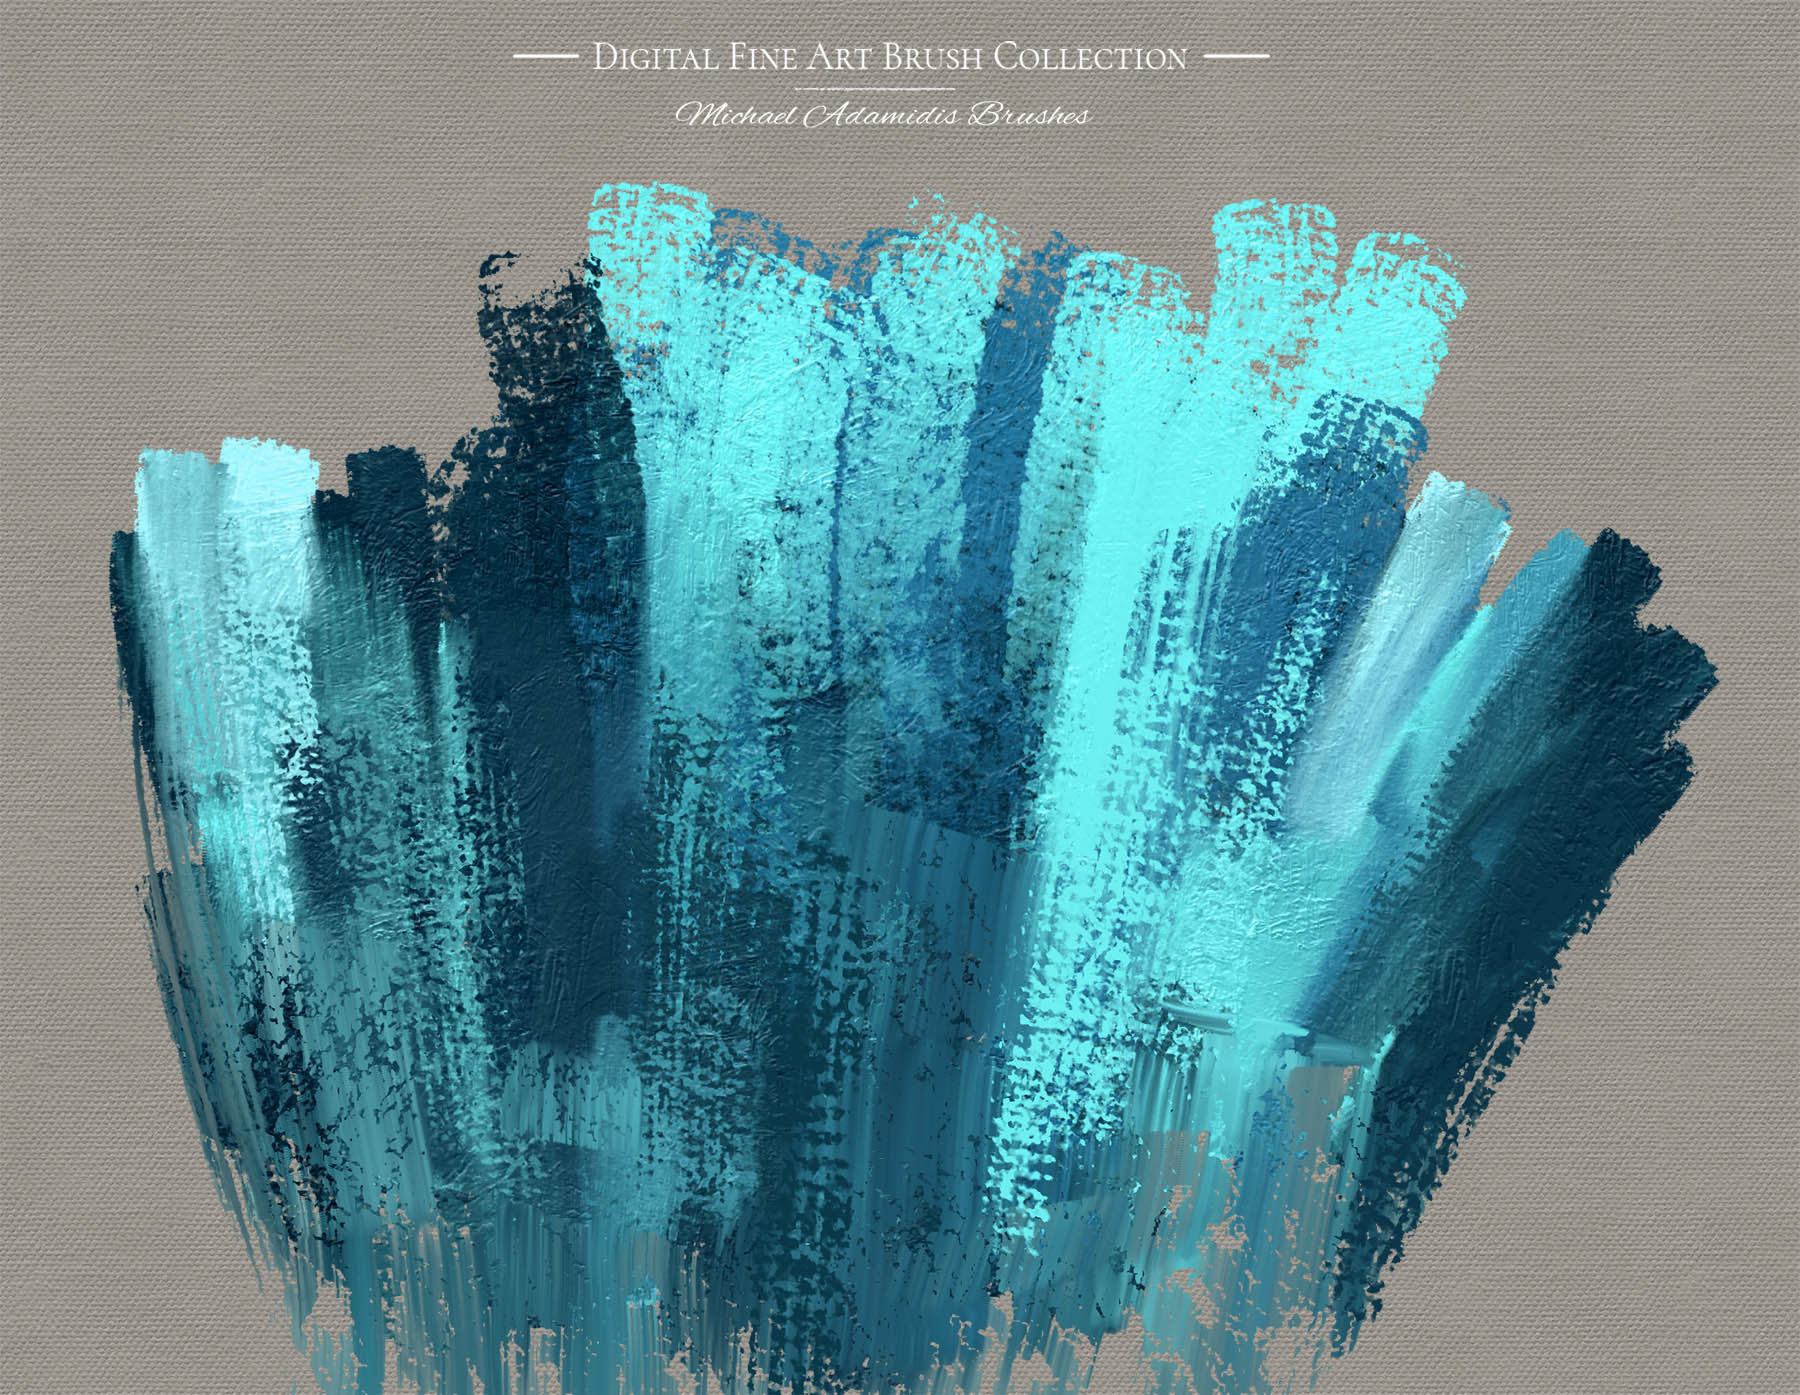 ArtStation - Digital Fine Art Painting Brushes for Photoshop